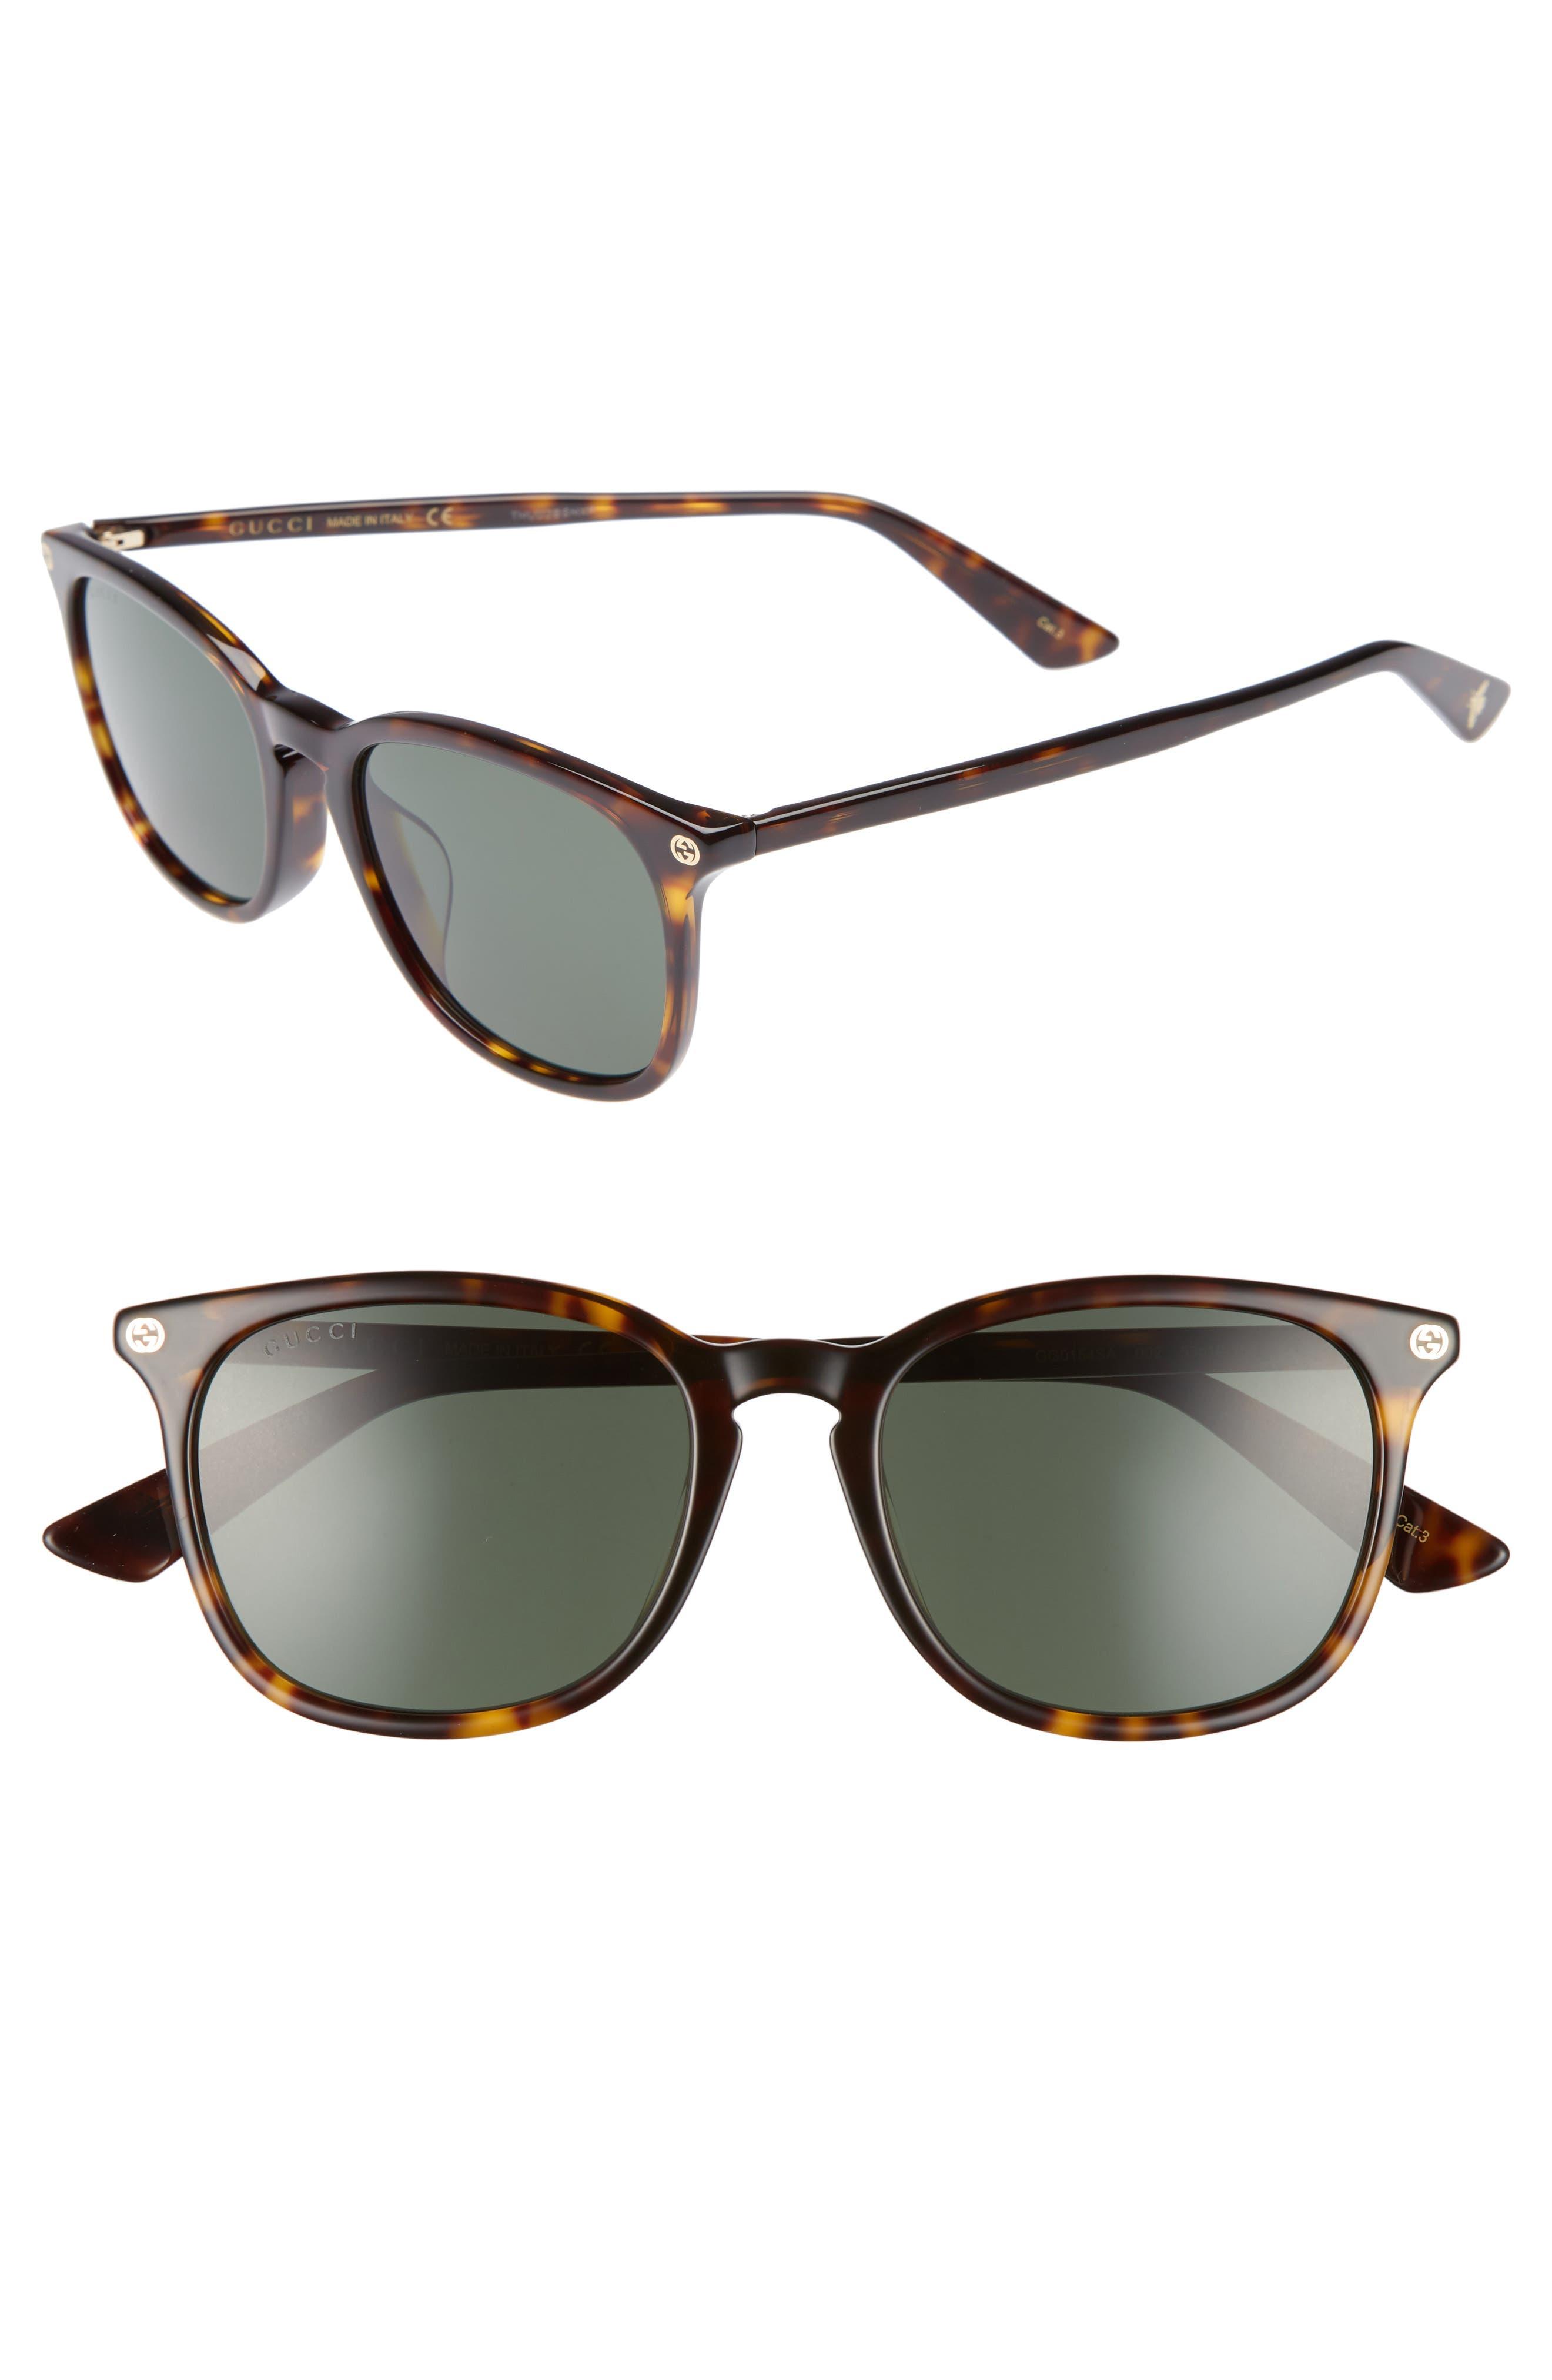 Gucci 53mm Sunglasses